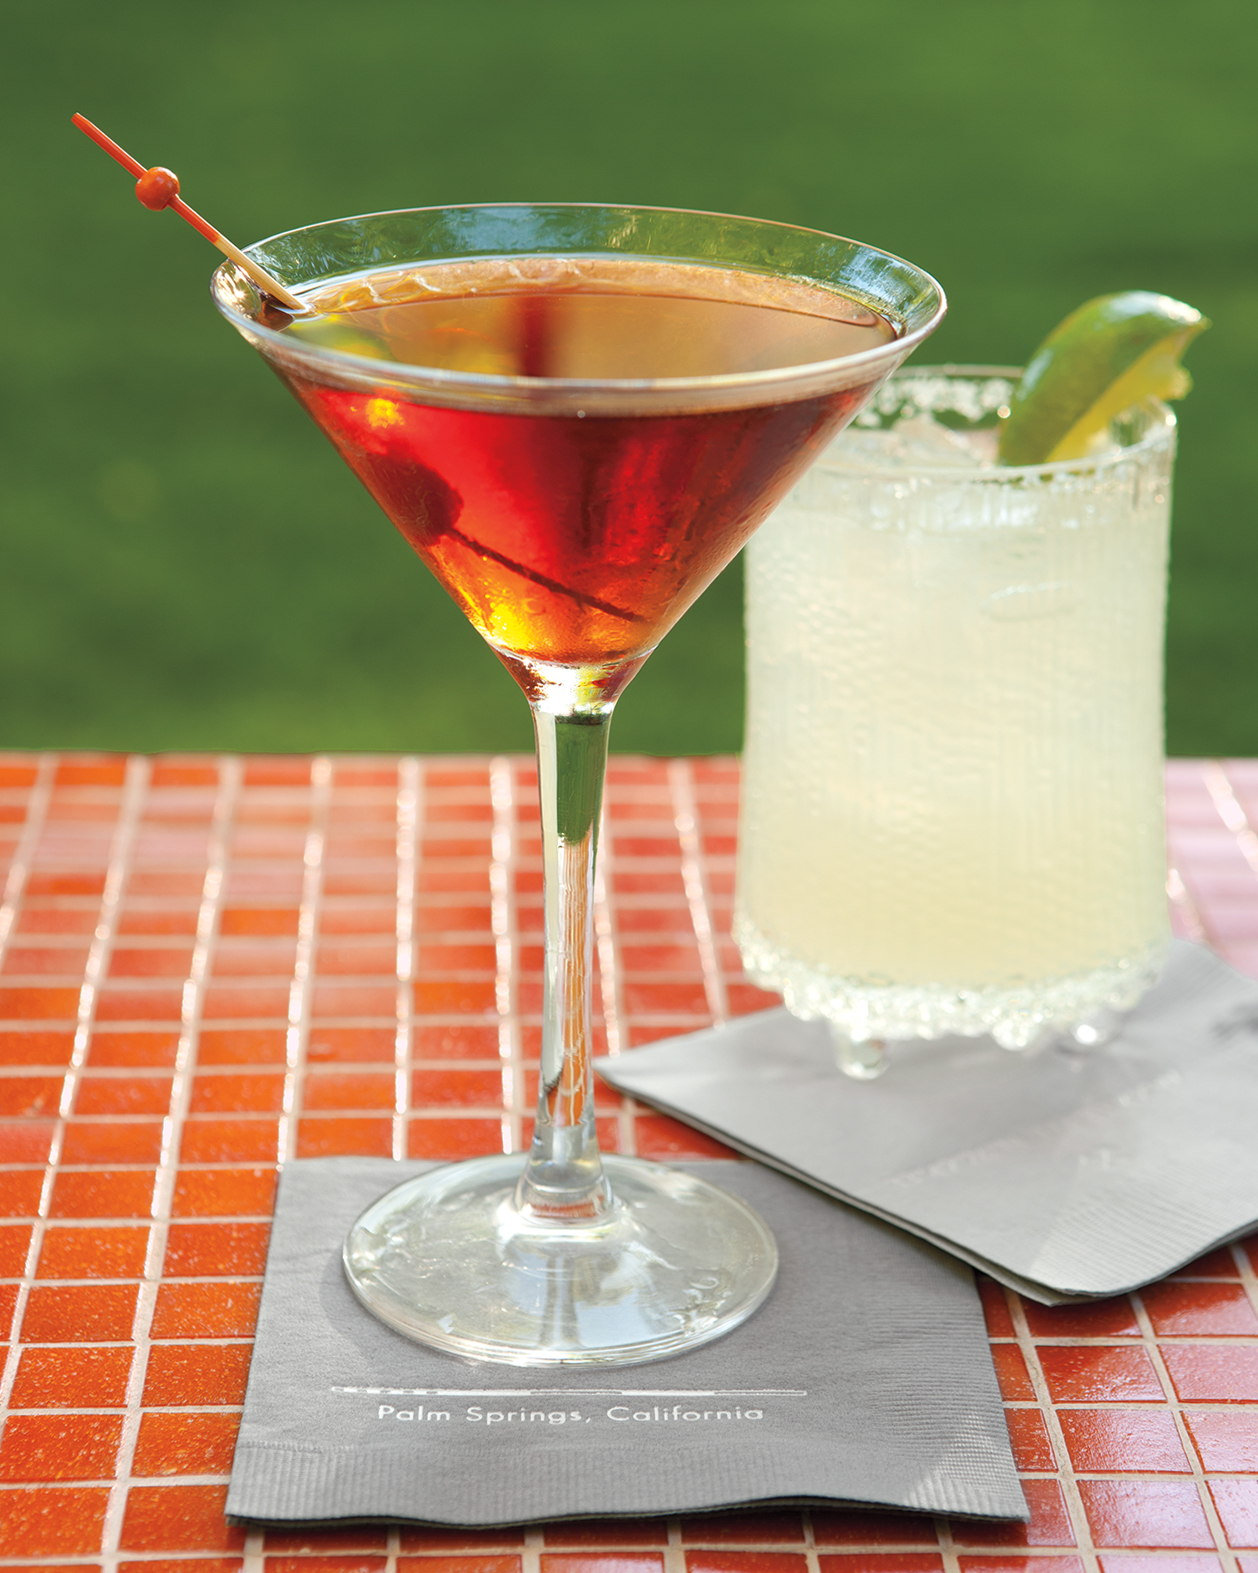 gabe-amy-cocktails6-013-mwd108251.jpg